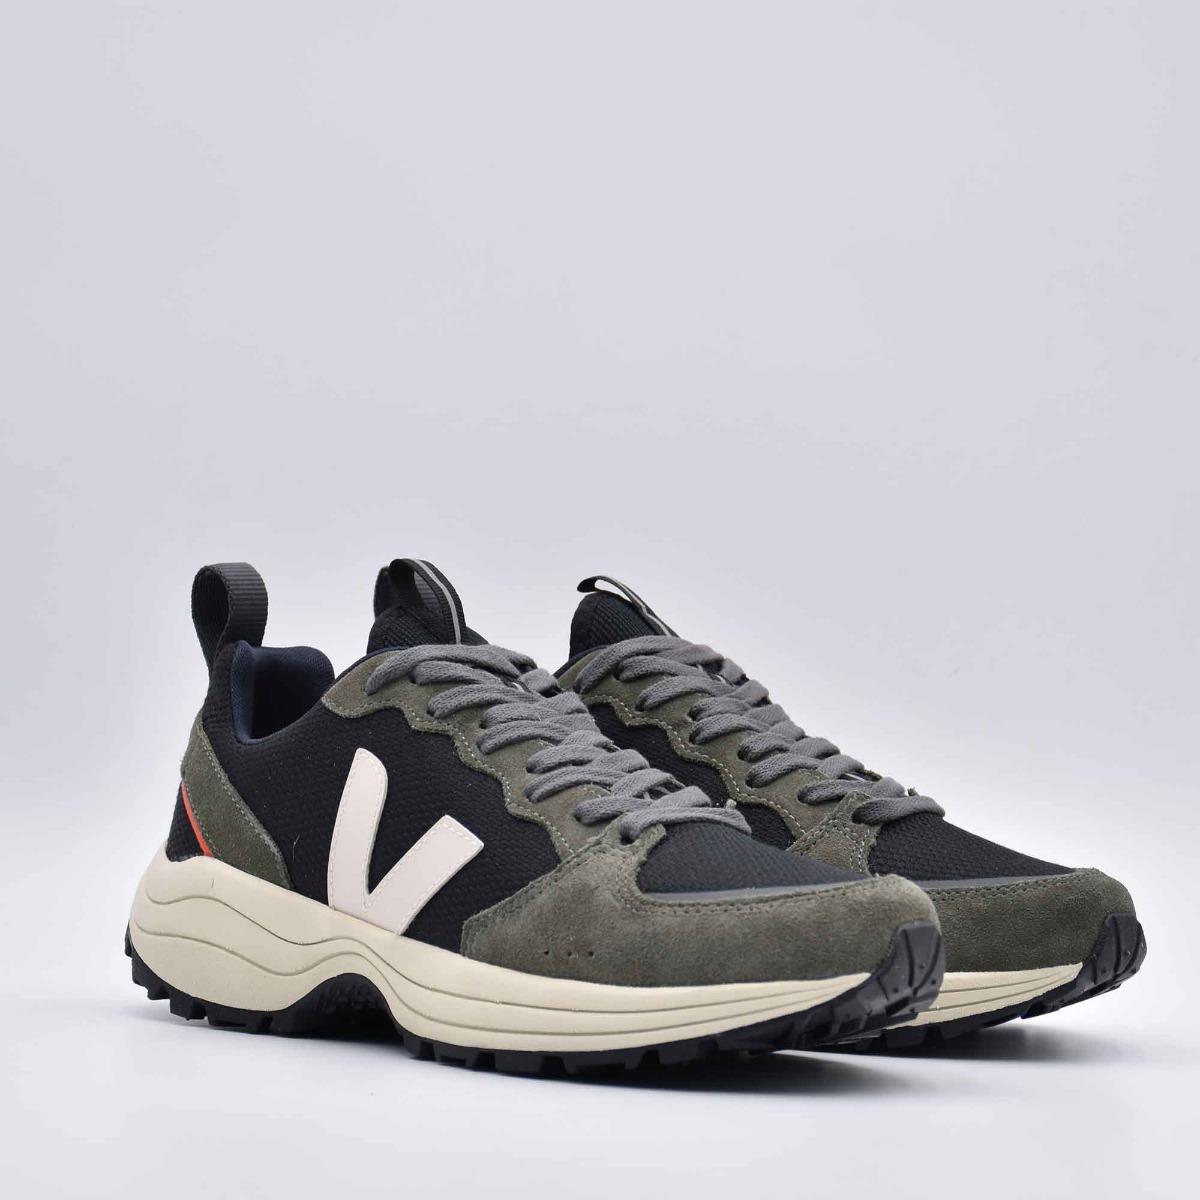 Sneaker venturi bastille- Nero/Verde